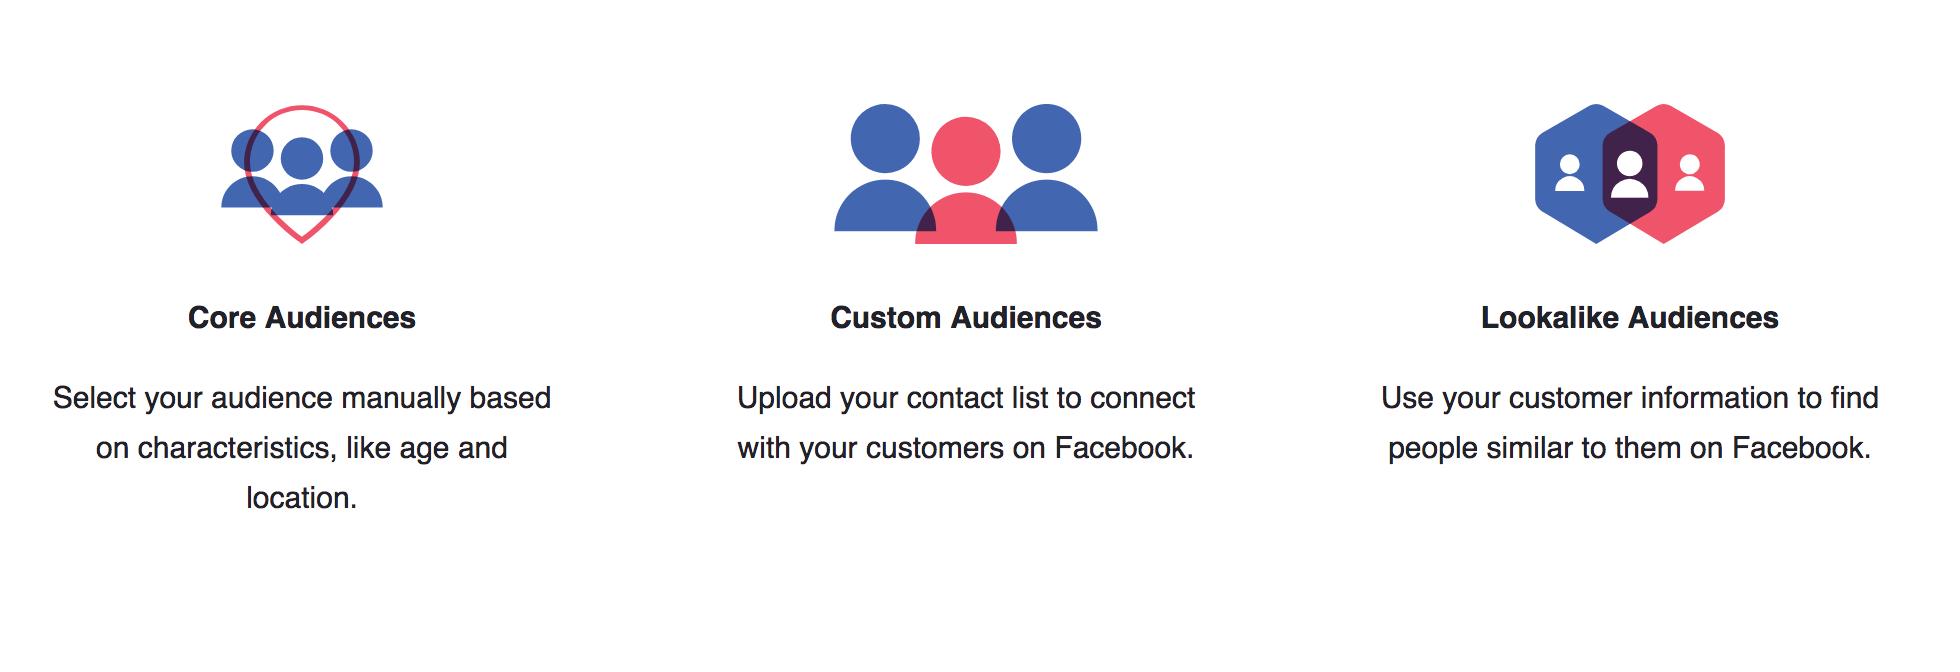 Facebook Audience คือ